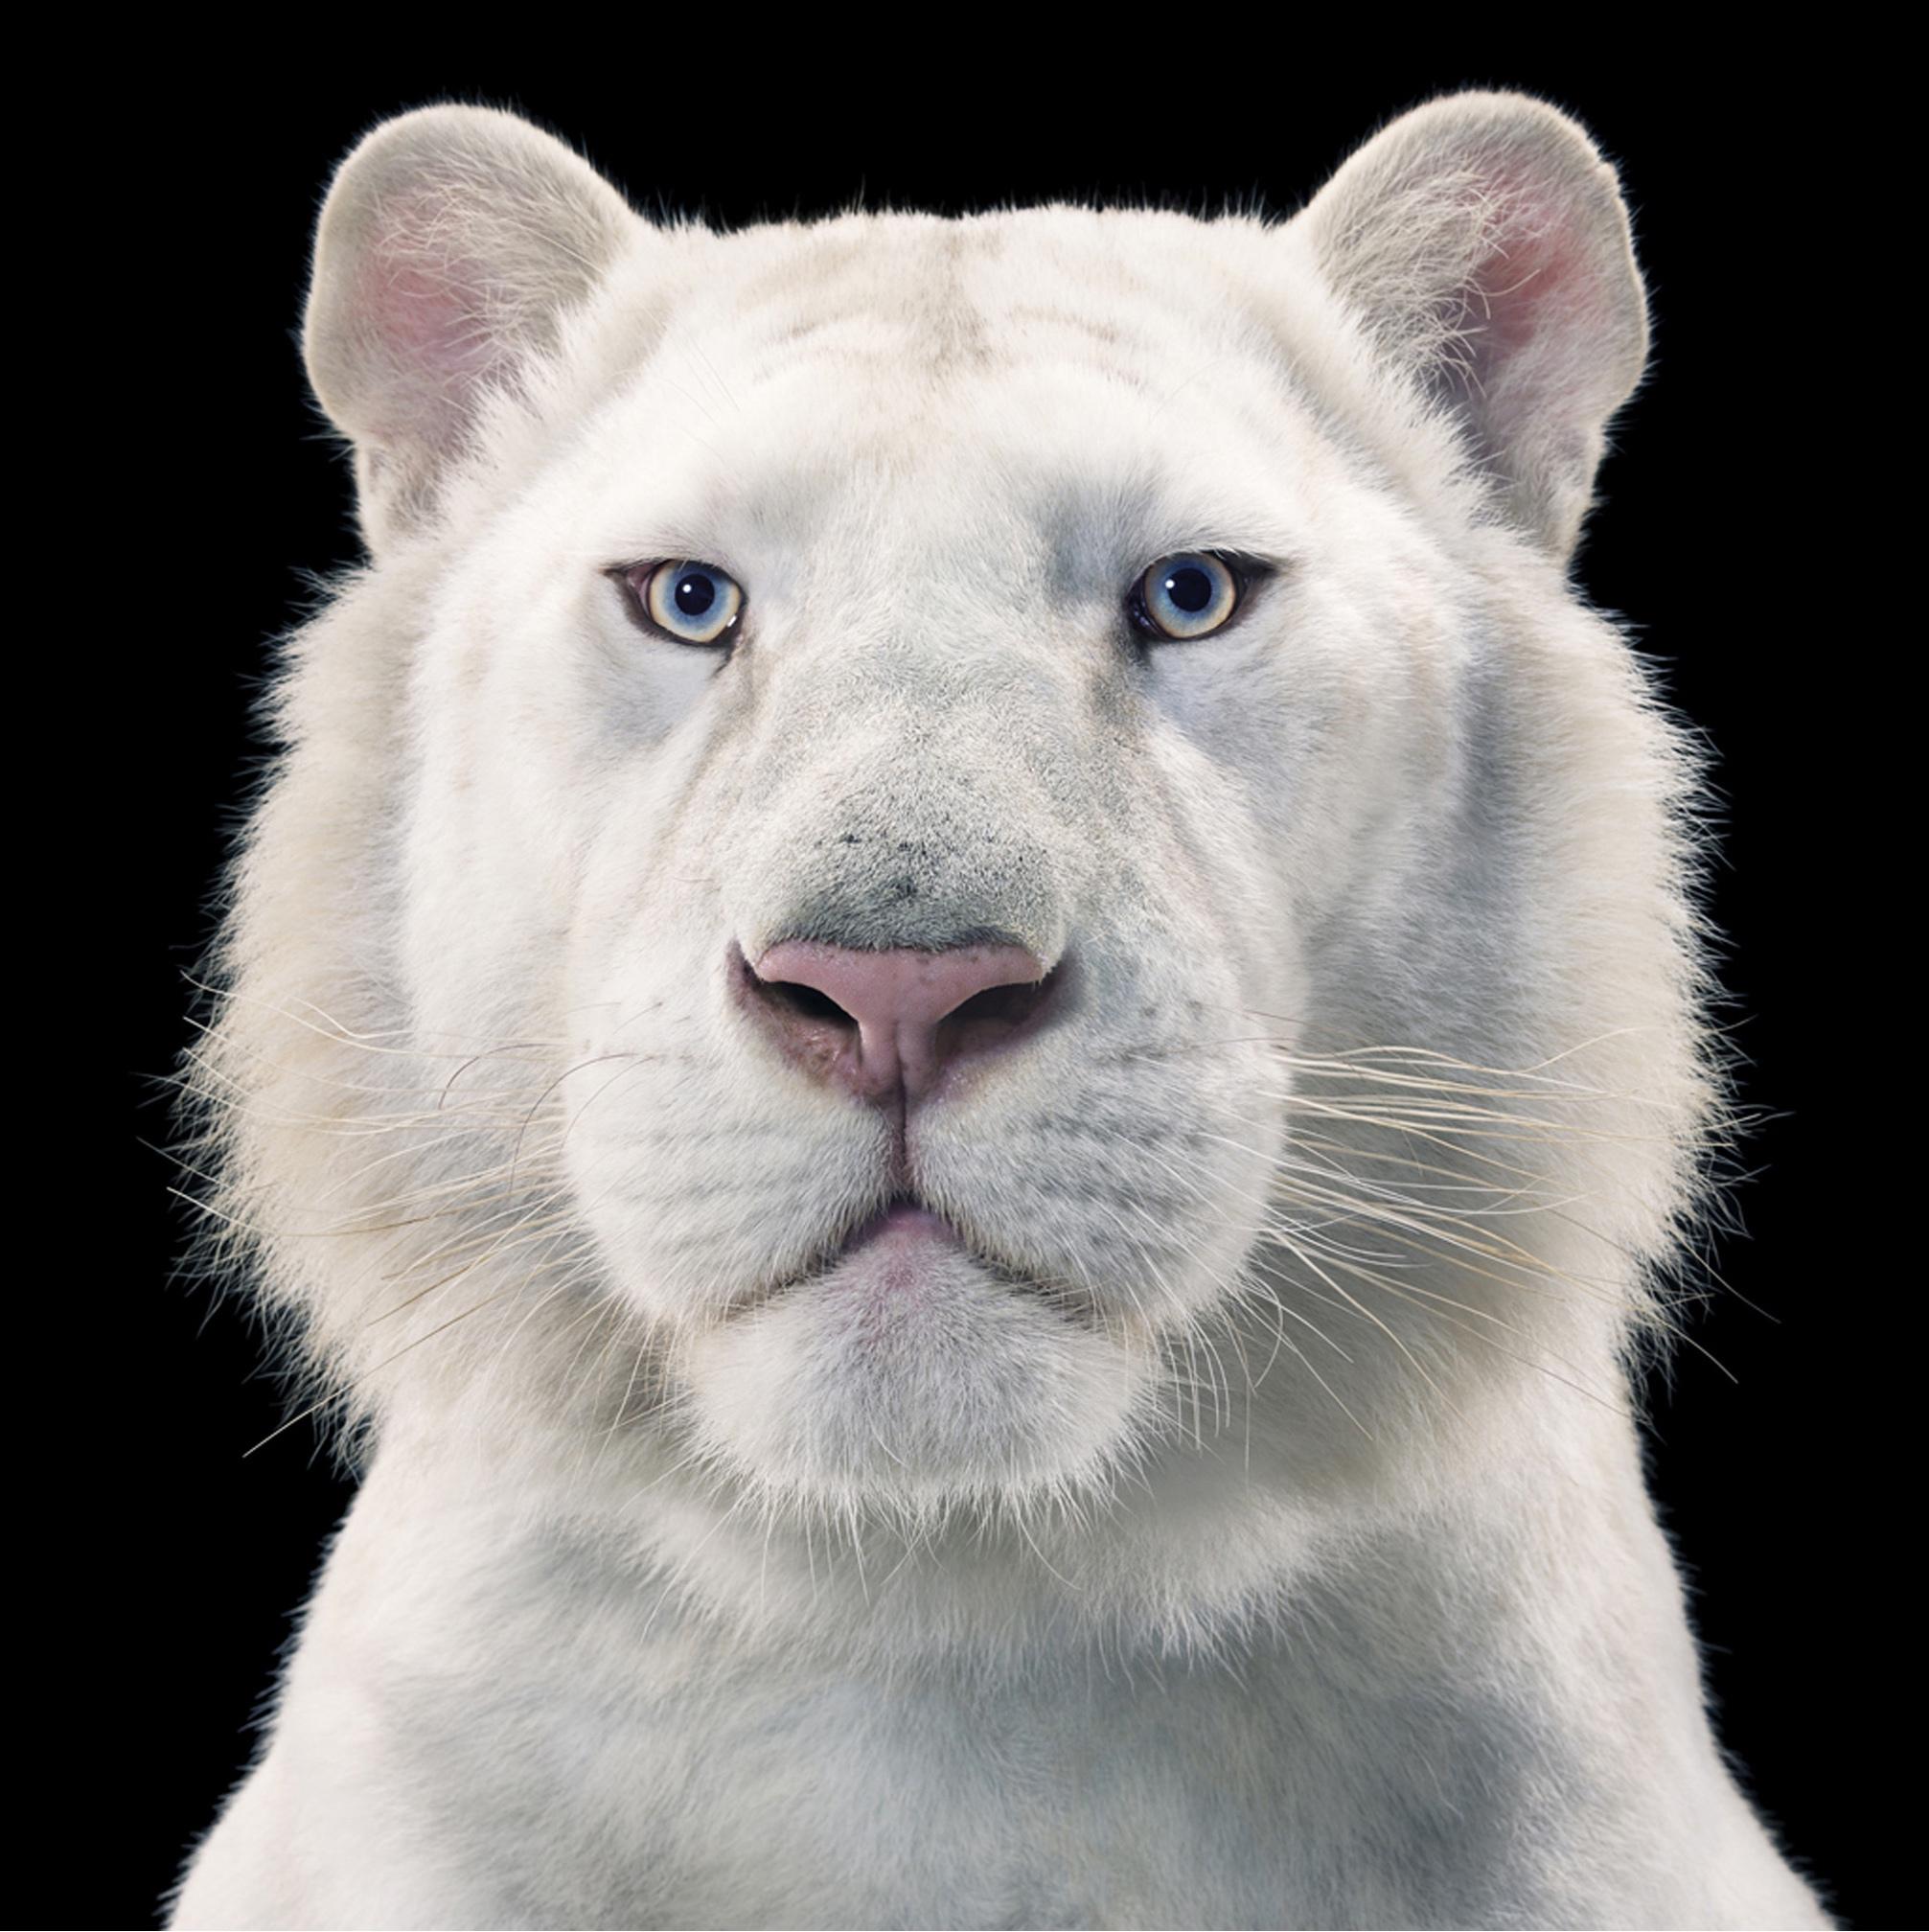 Snow White Tiger by Tim Flach